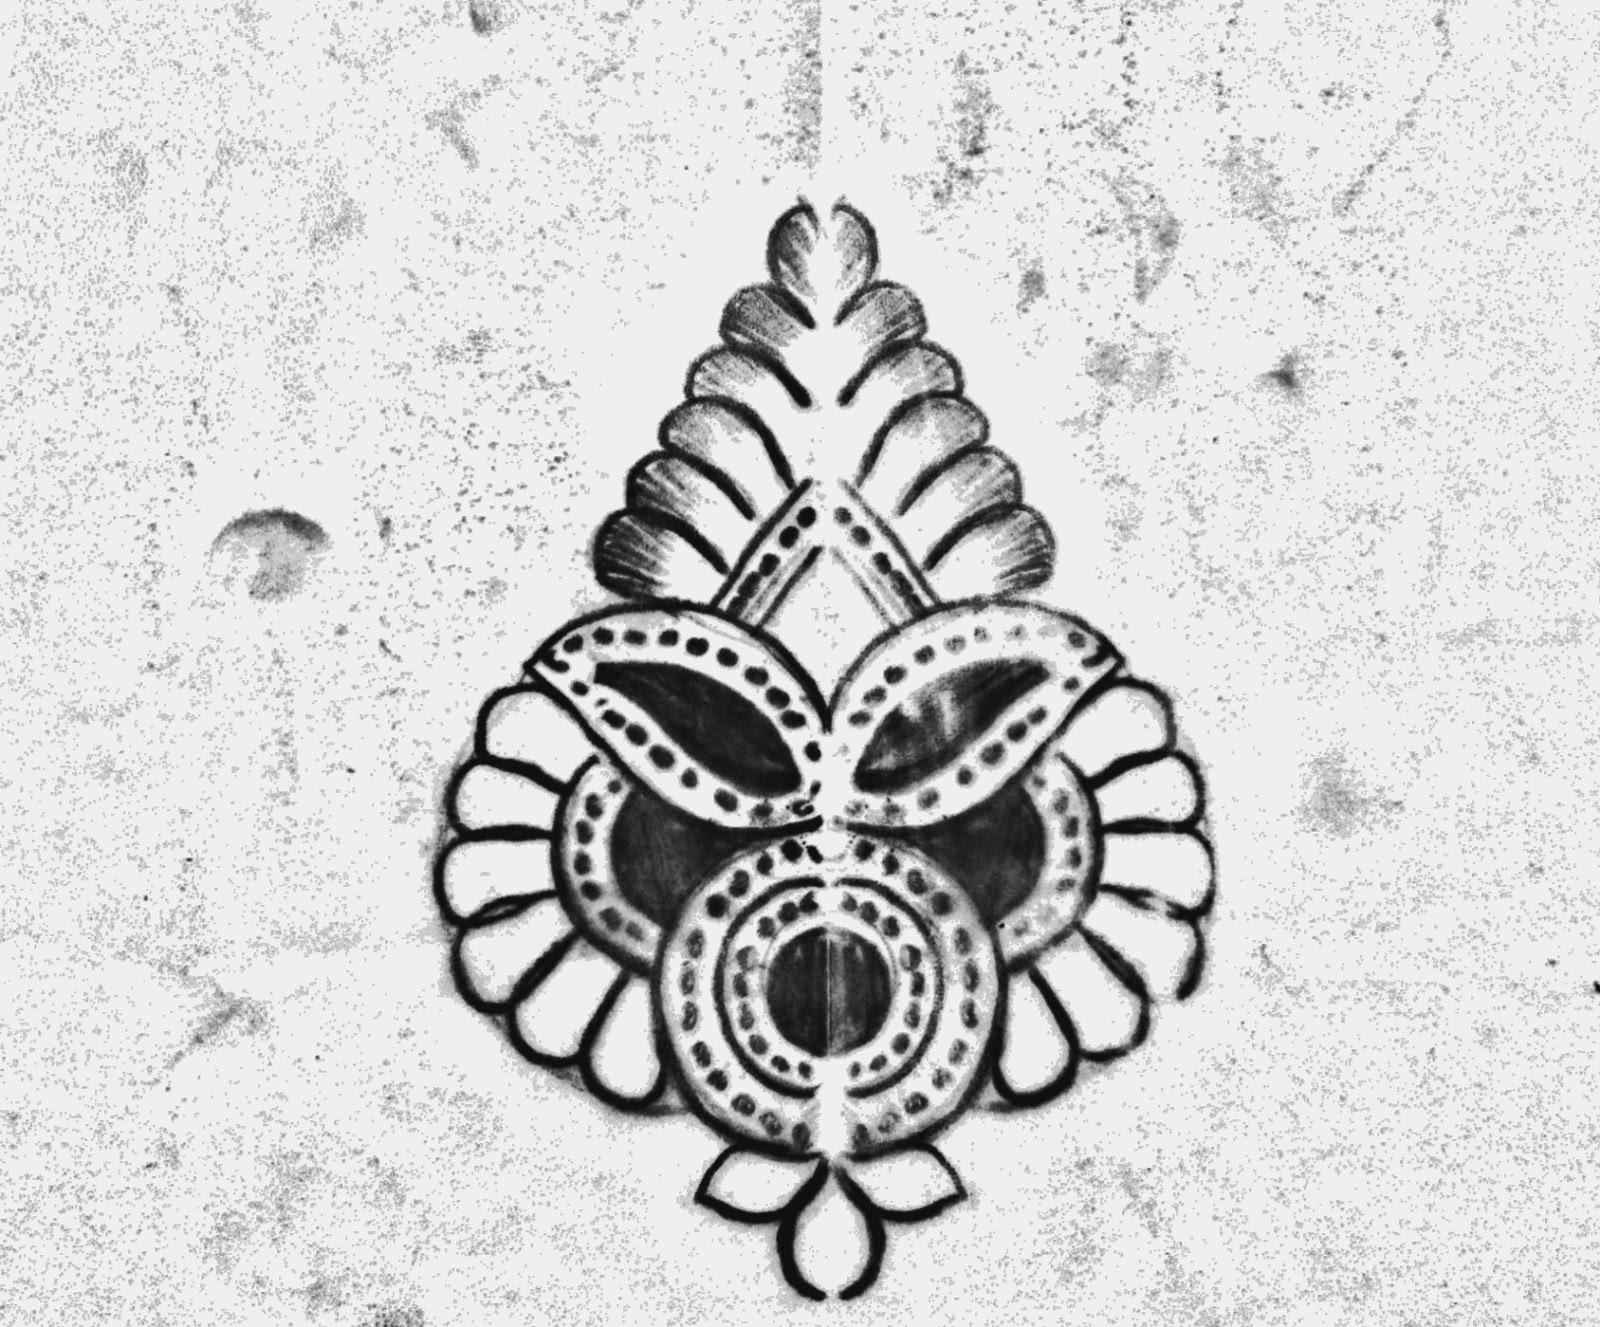 Small butta butta all over saree design patterns on tracing paper.embroidery design pencil sketch.